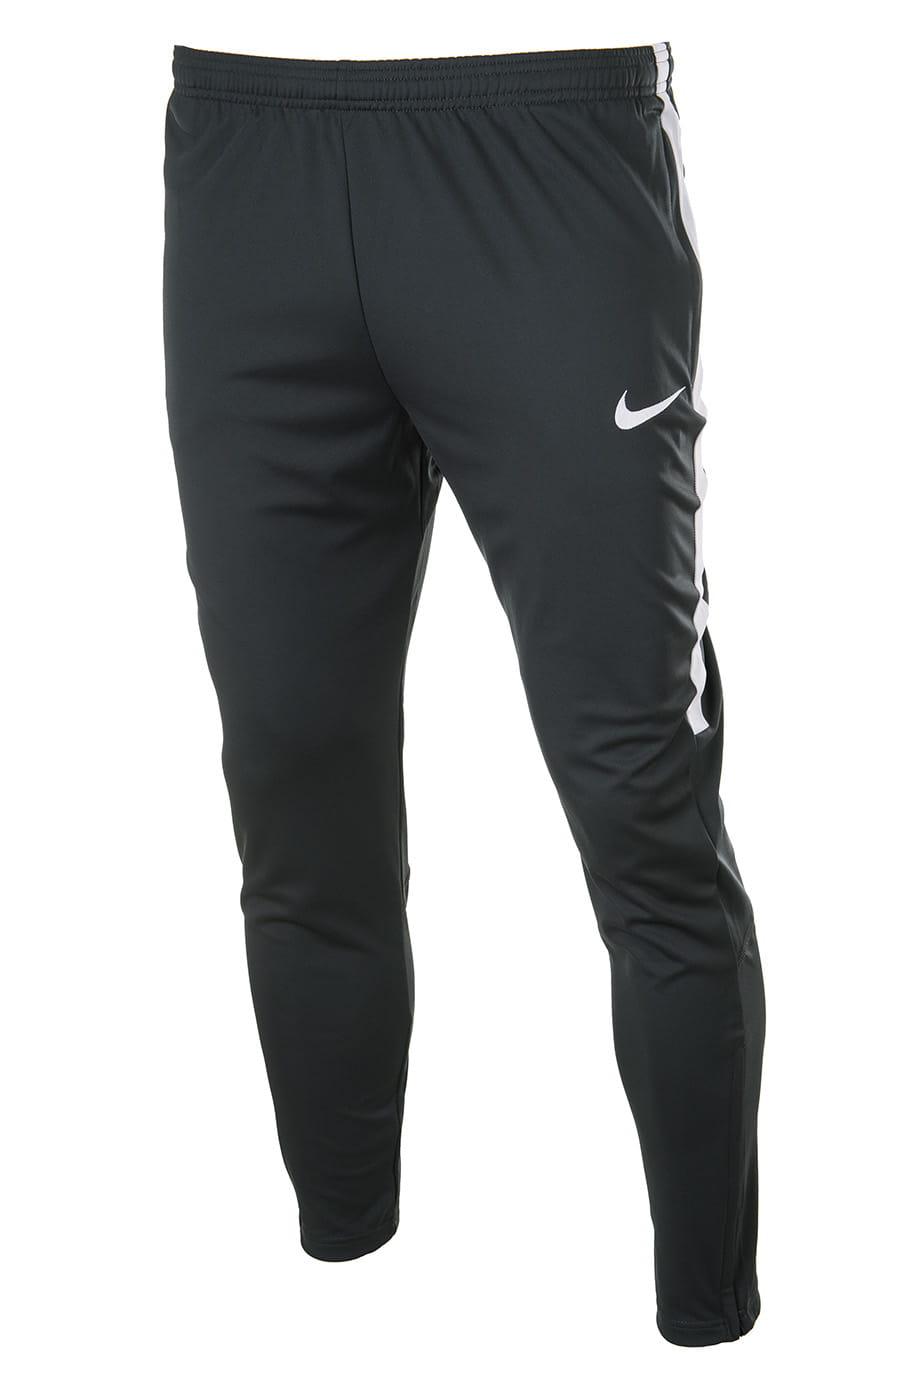 Calça Nike Dry Pant Academy - Cinza